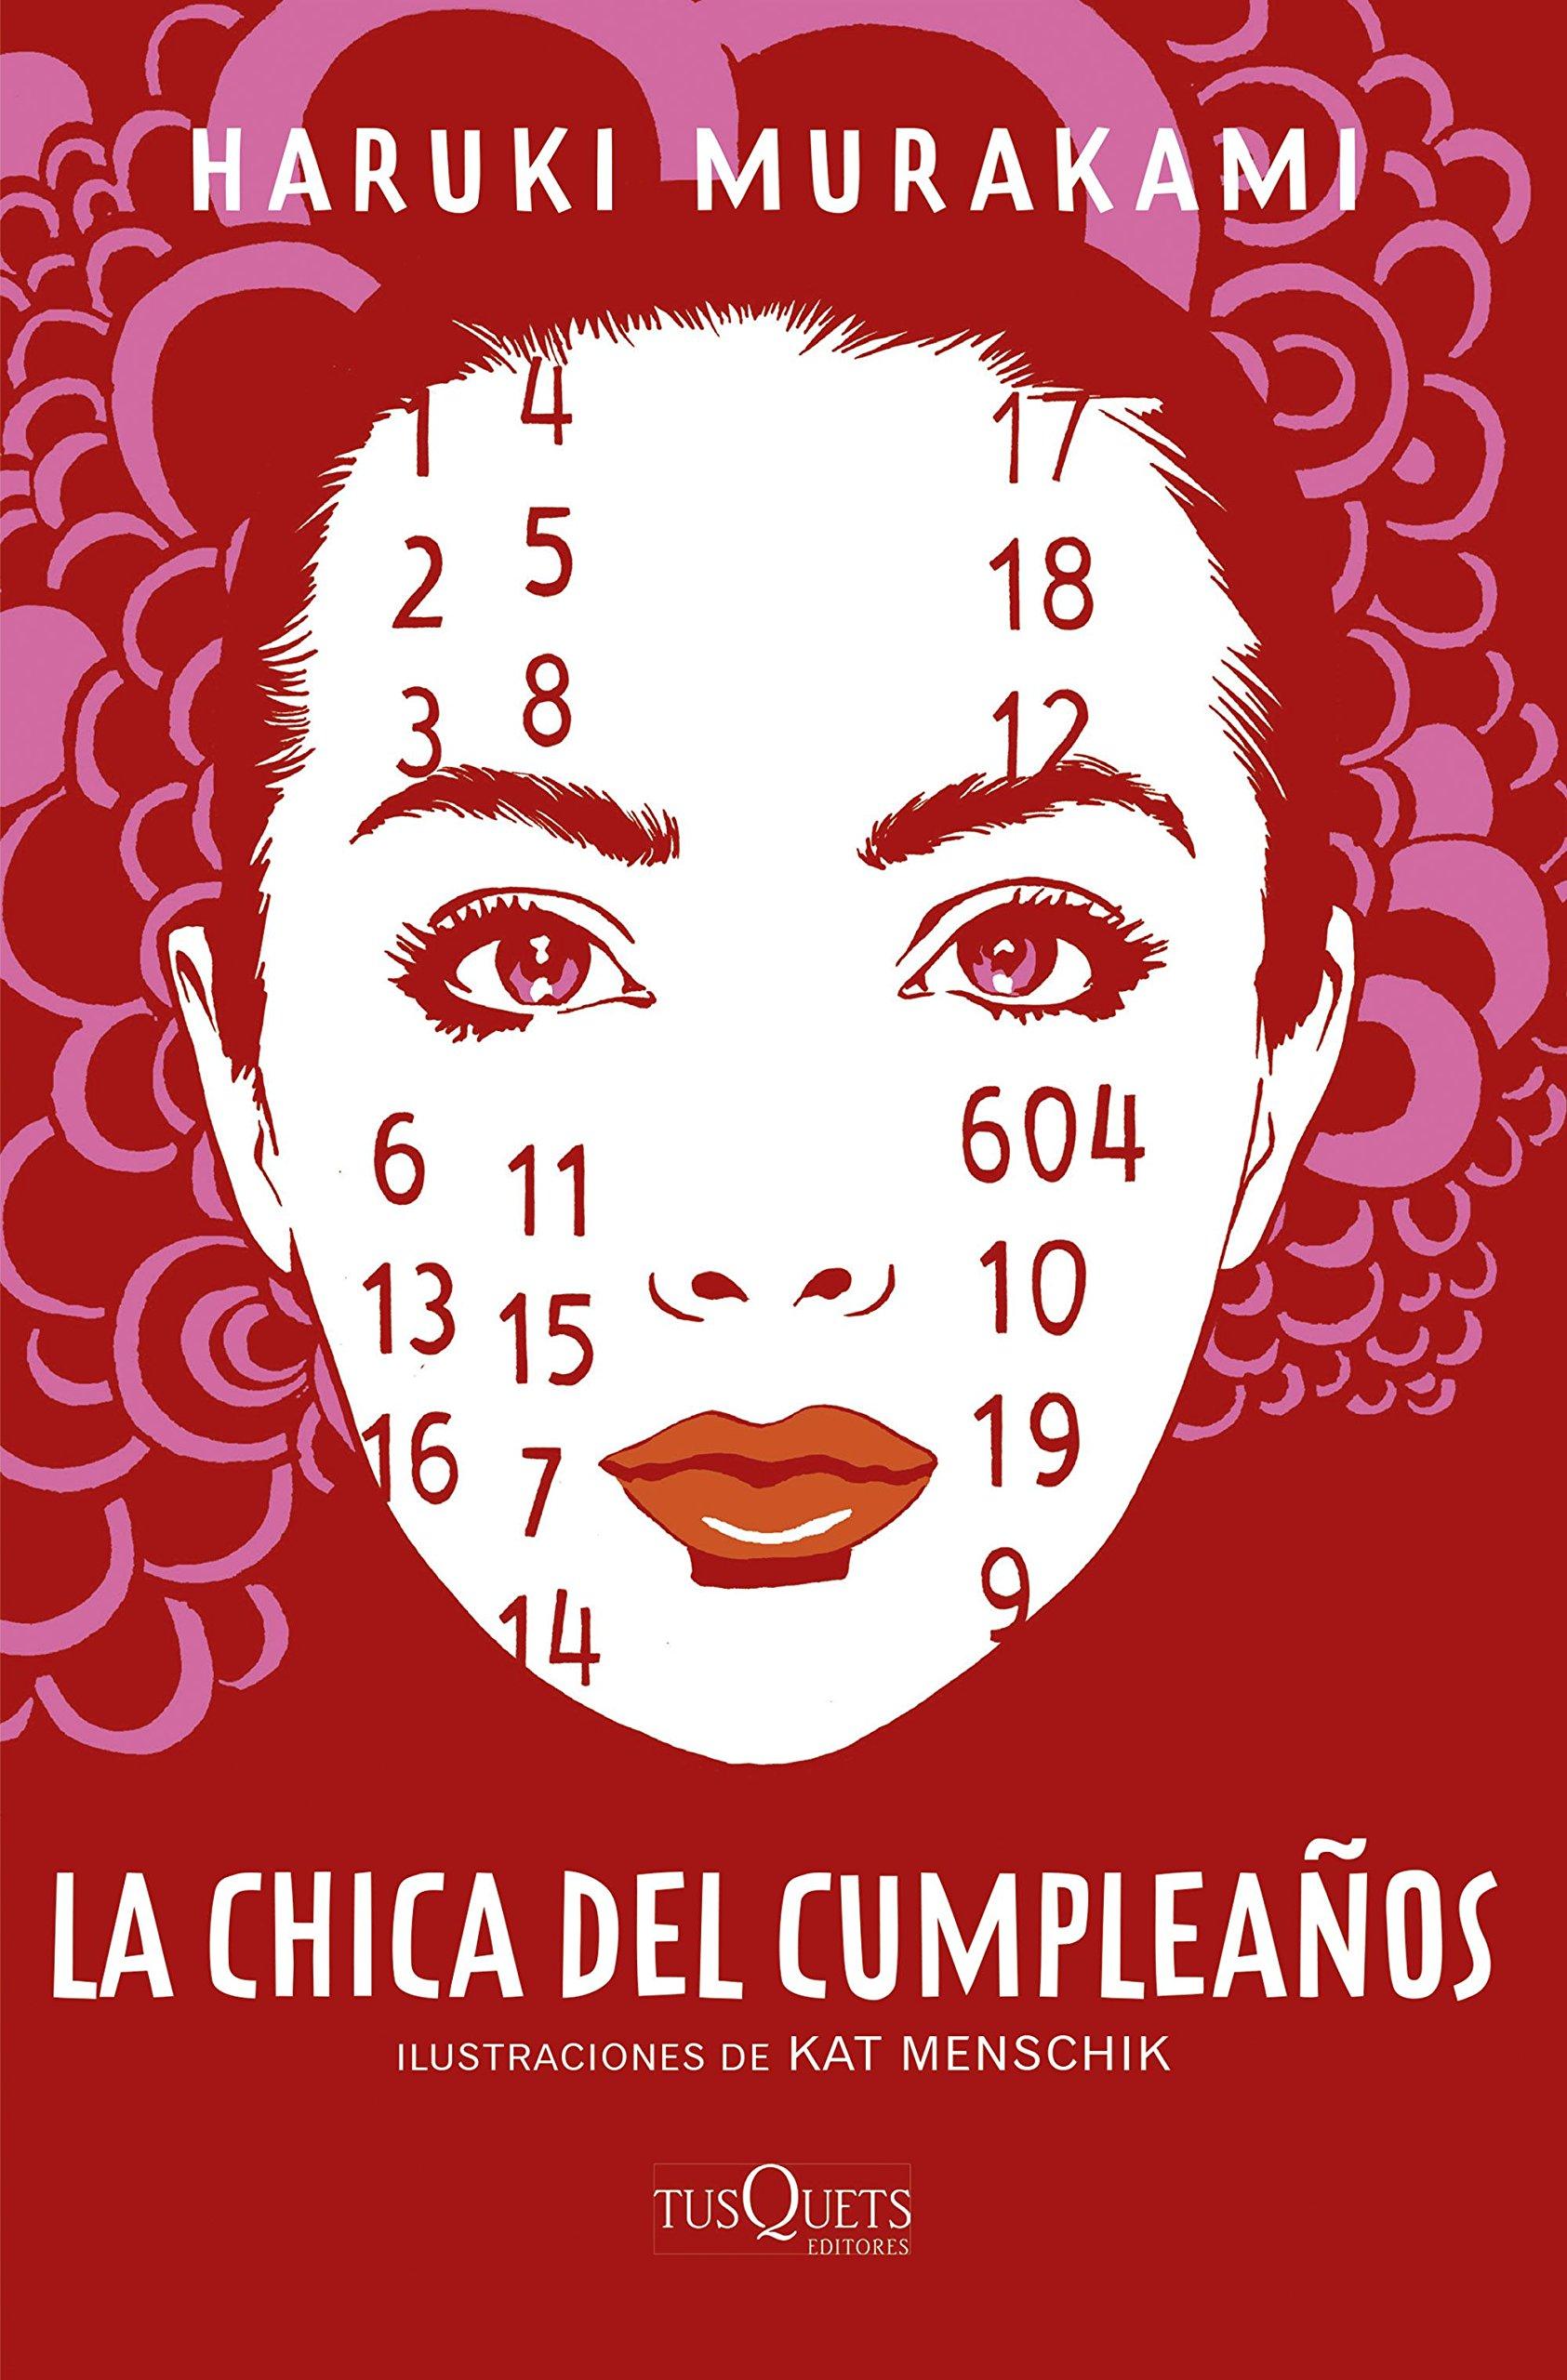 La chica del cumpleanos (Spanish Edition): Haruki Murakami ...